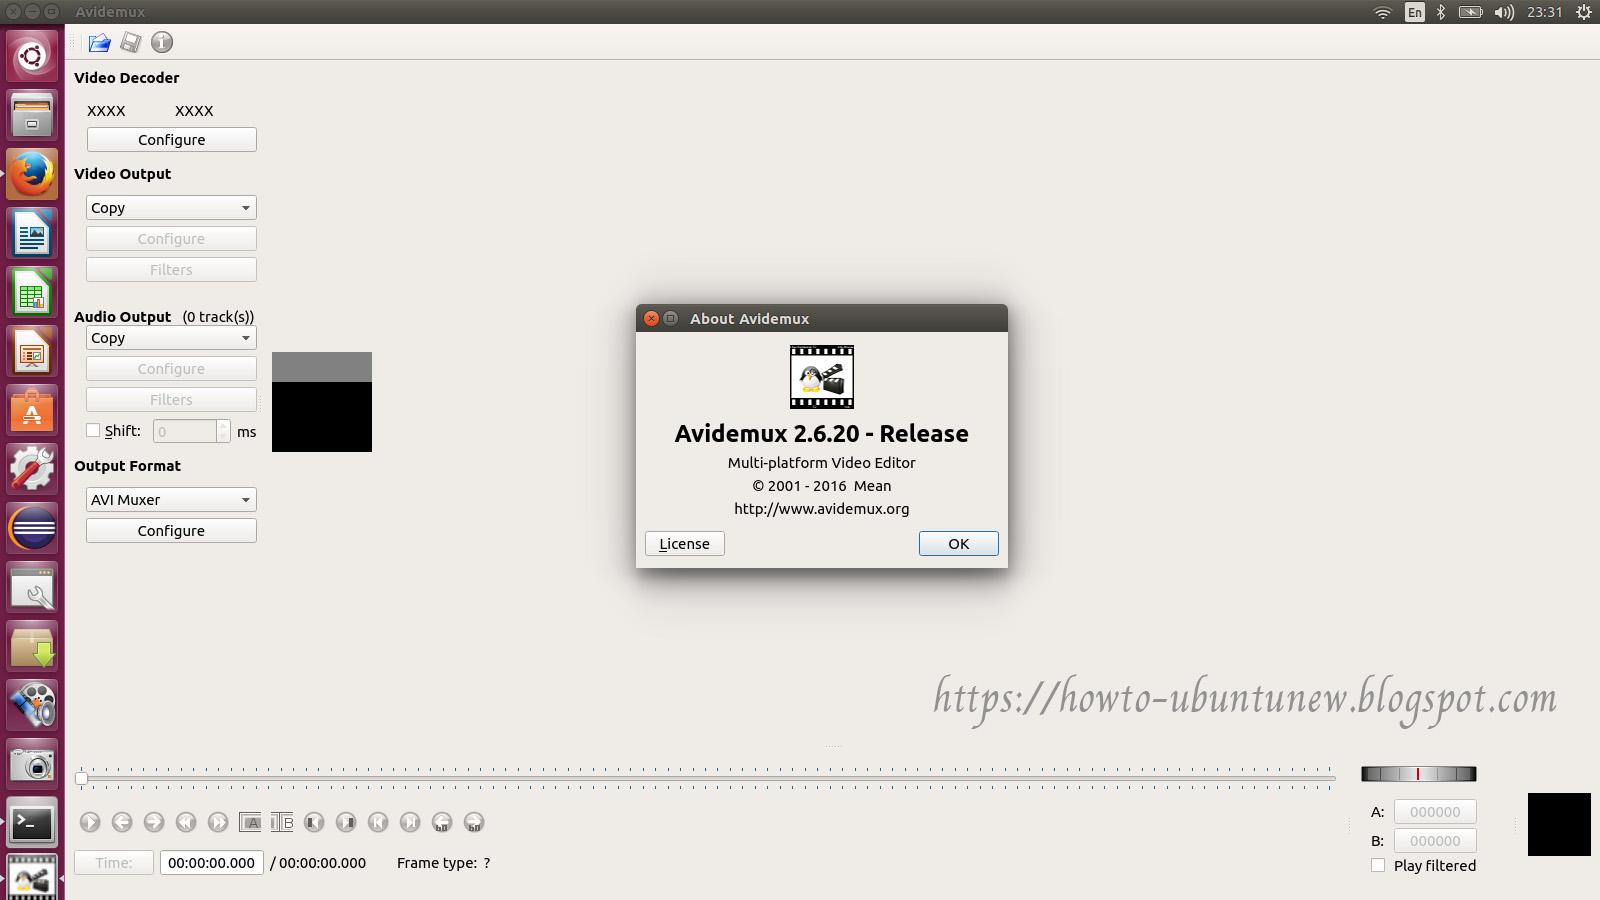 How to install program on Ubuntu: How to install Avidemux